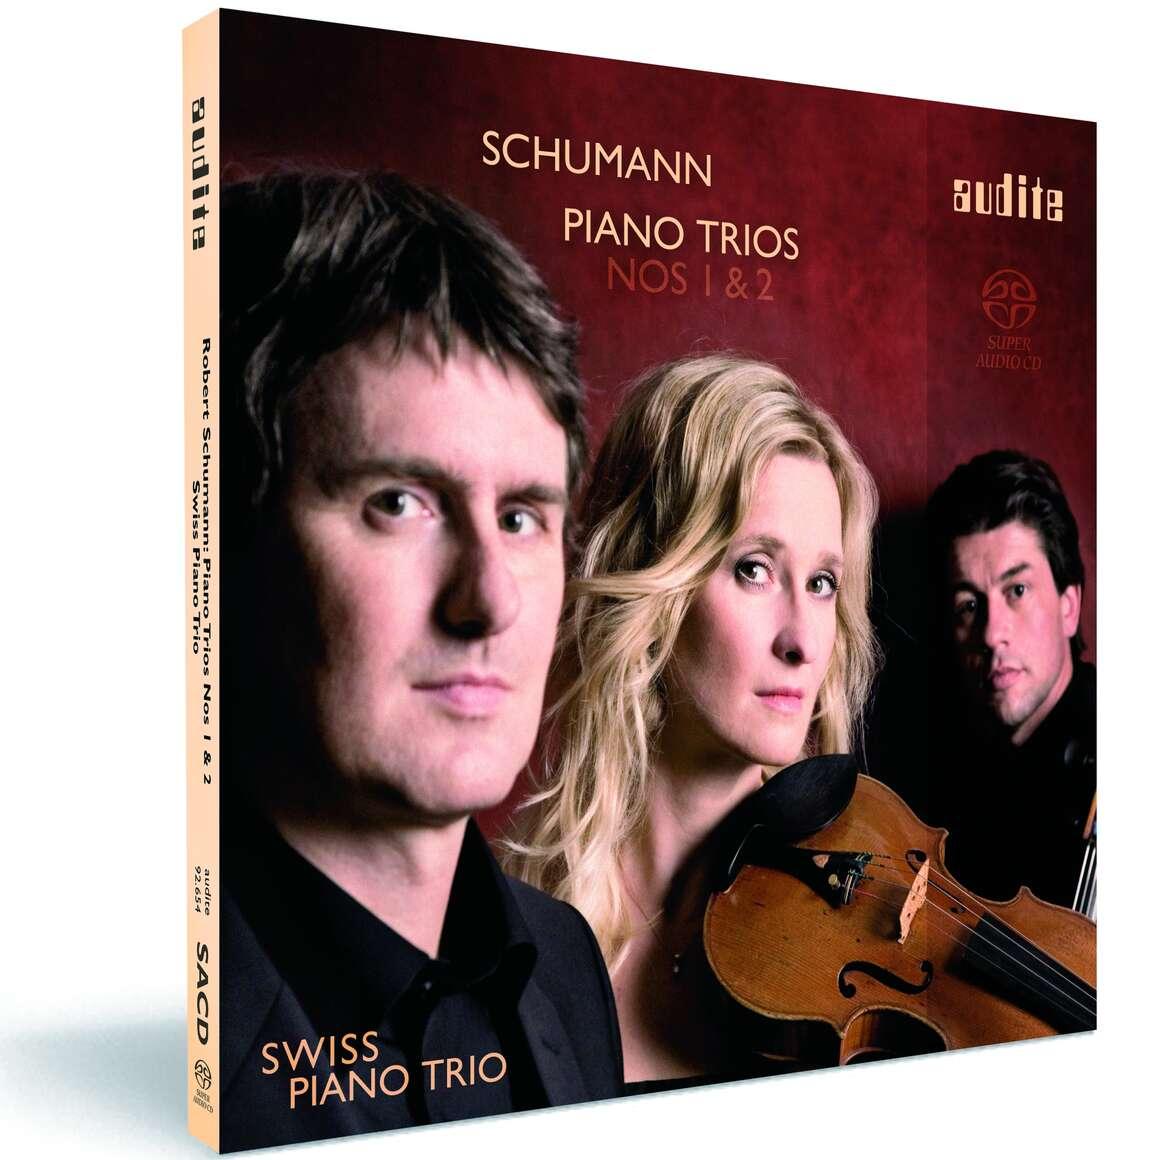 R. Schumann: Piano Trios Nos 1 & 2 (Op. 63 & 80)